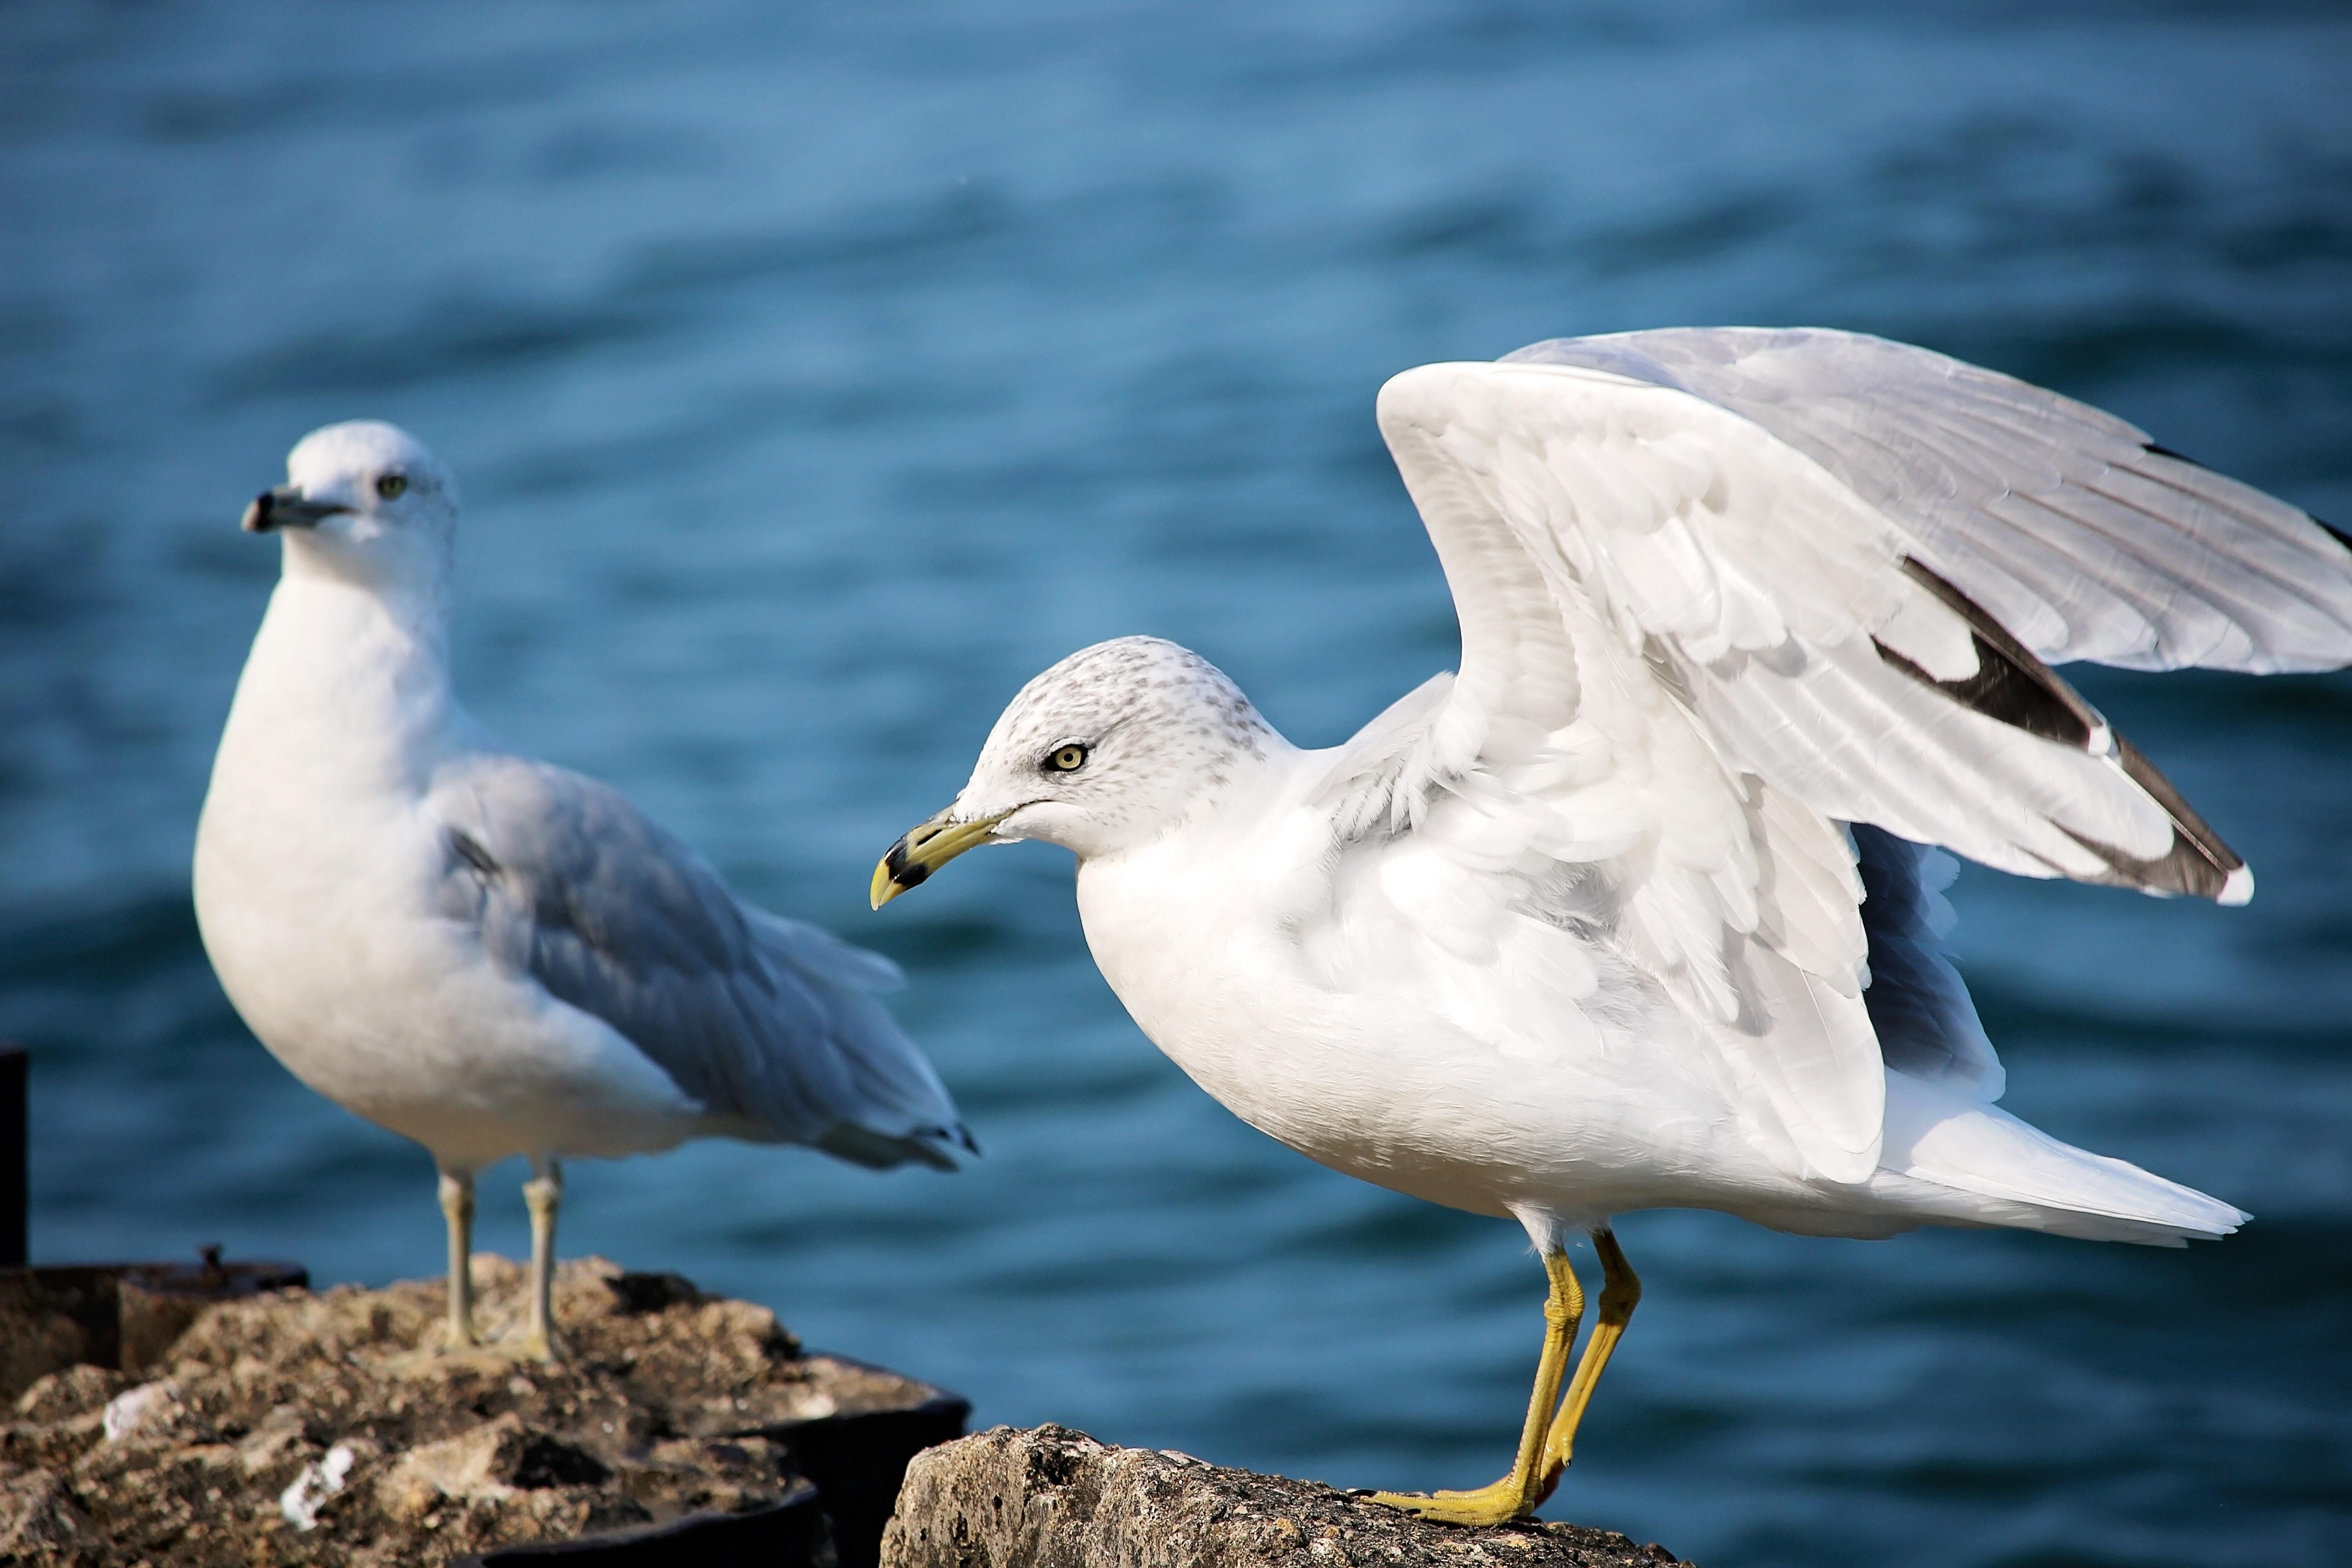 A gratuitous menacing seagull